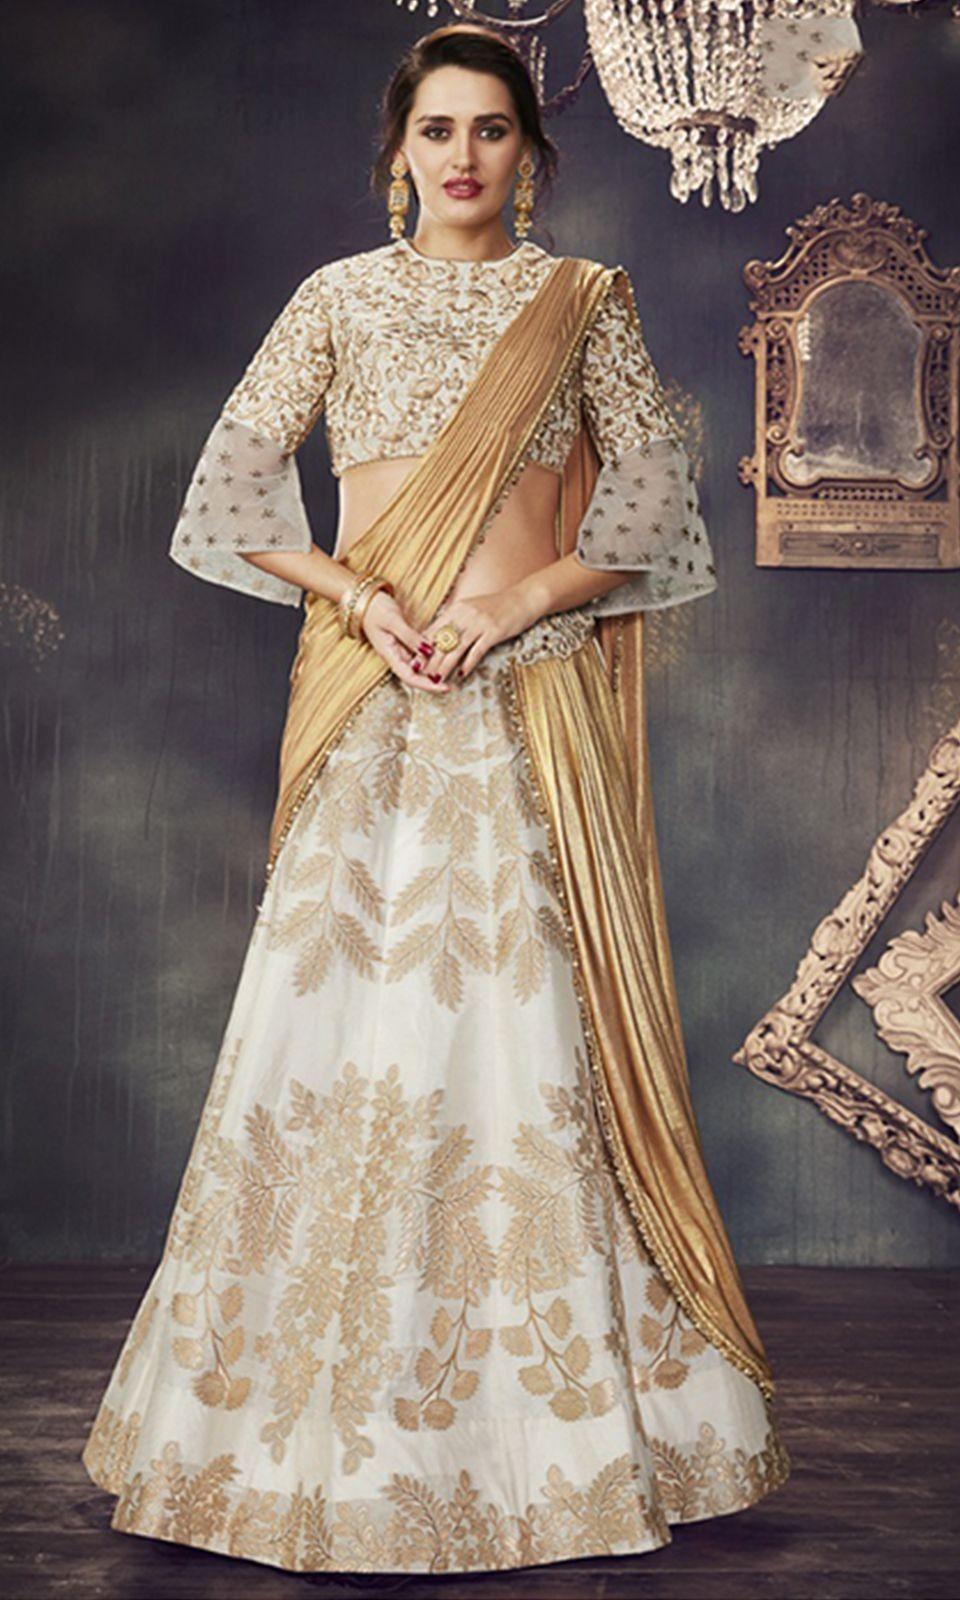 d4e4664e59 Shop this stunning #White and #Gold #Designer Wear #Lehenga #Saree (SKU  Code : LEHEVSD4718) Online at IshiMaya Fashion.